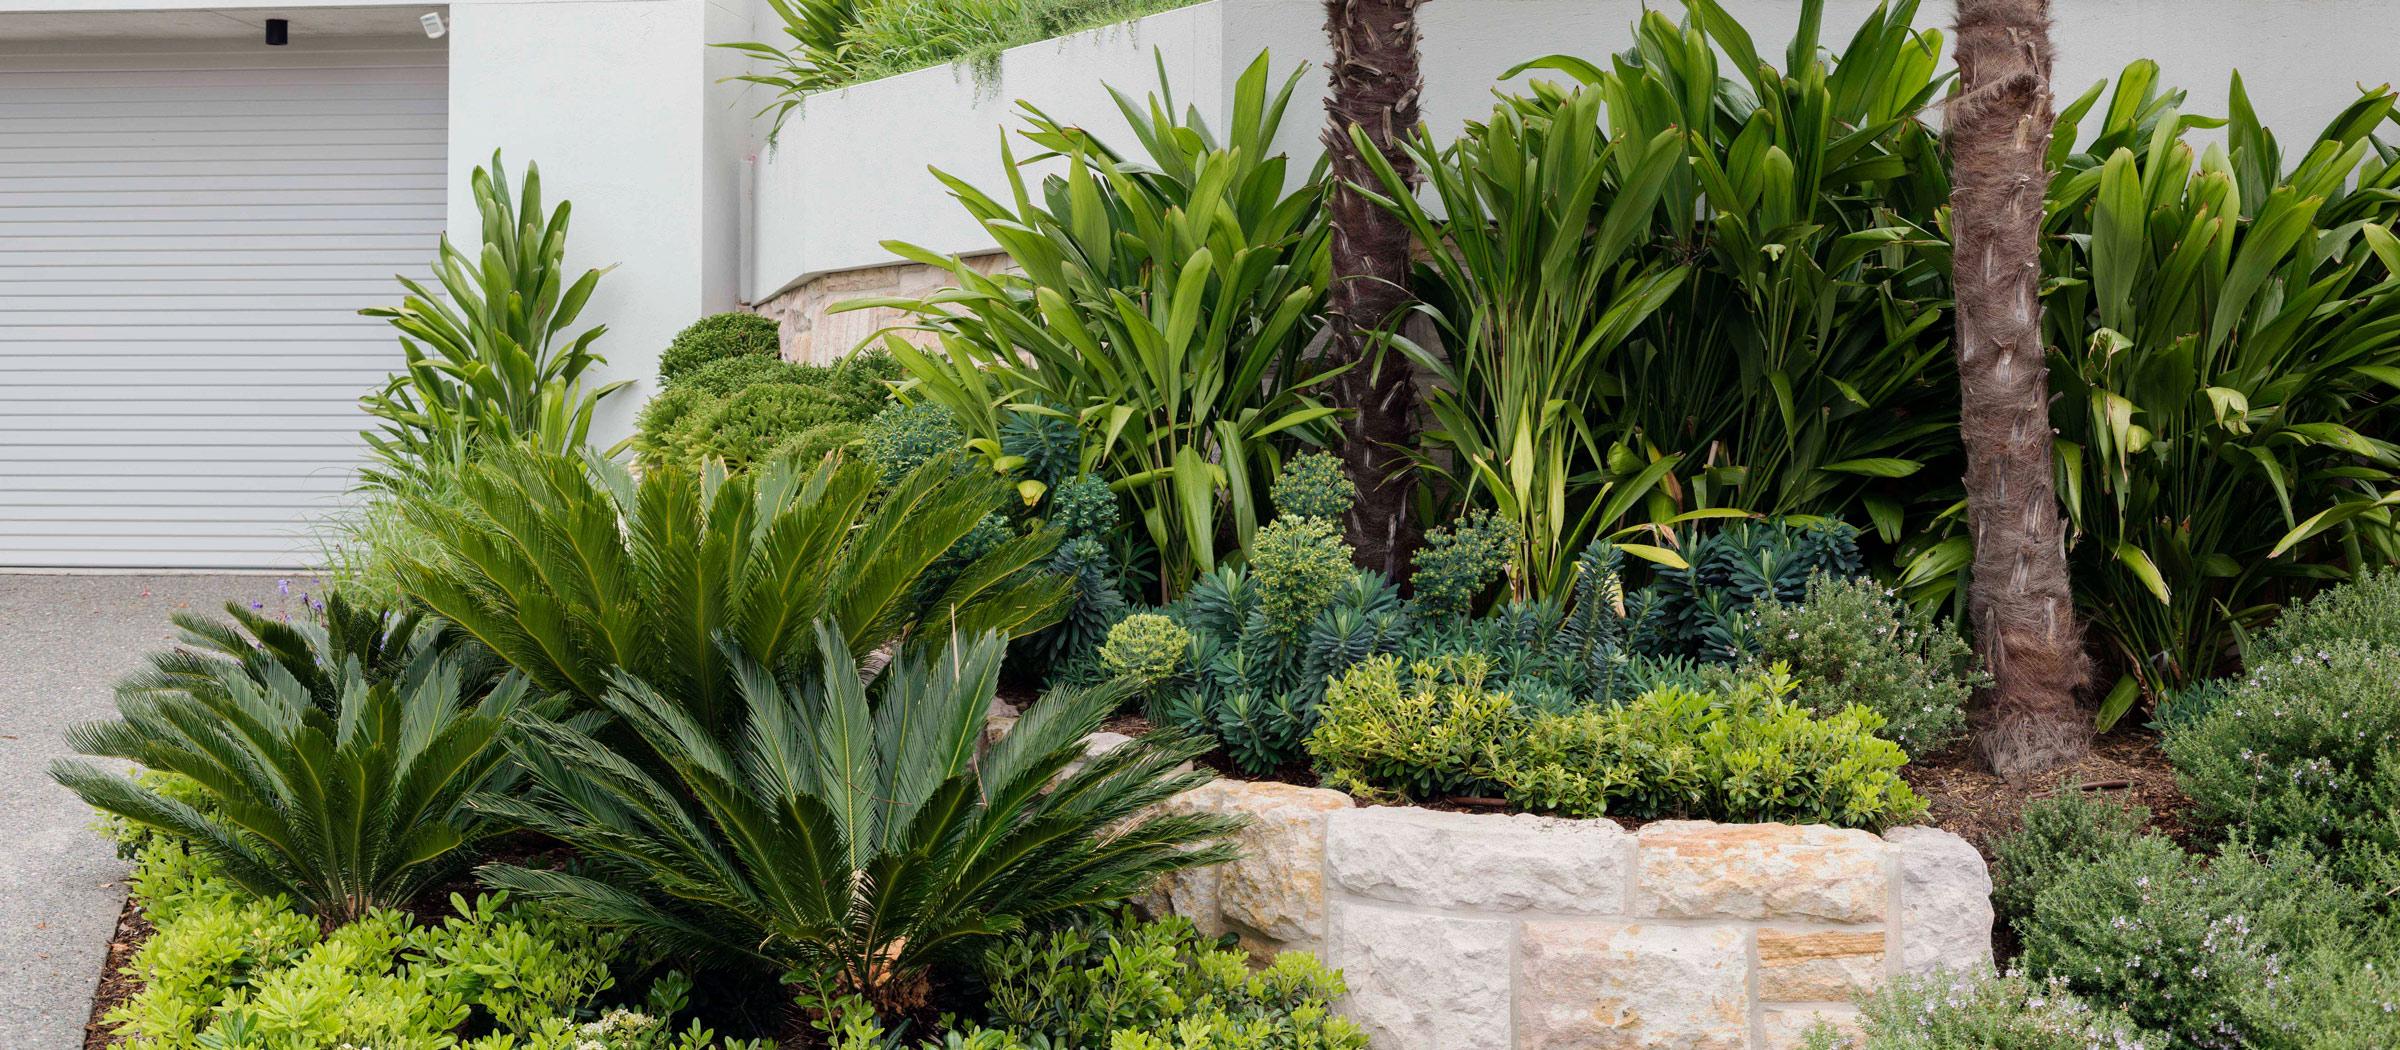 Secret Gardens A Book By Matthew Cantwell The Planthunter